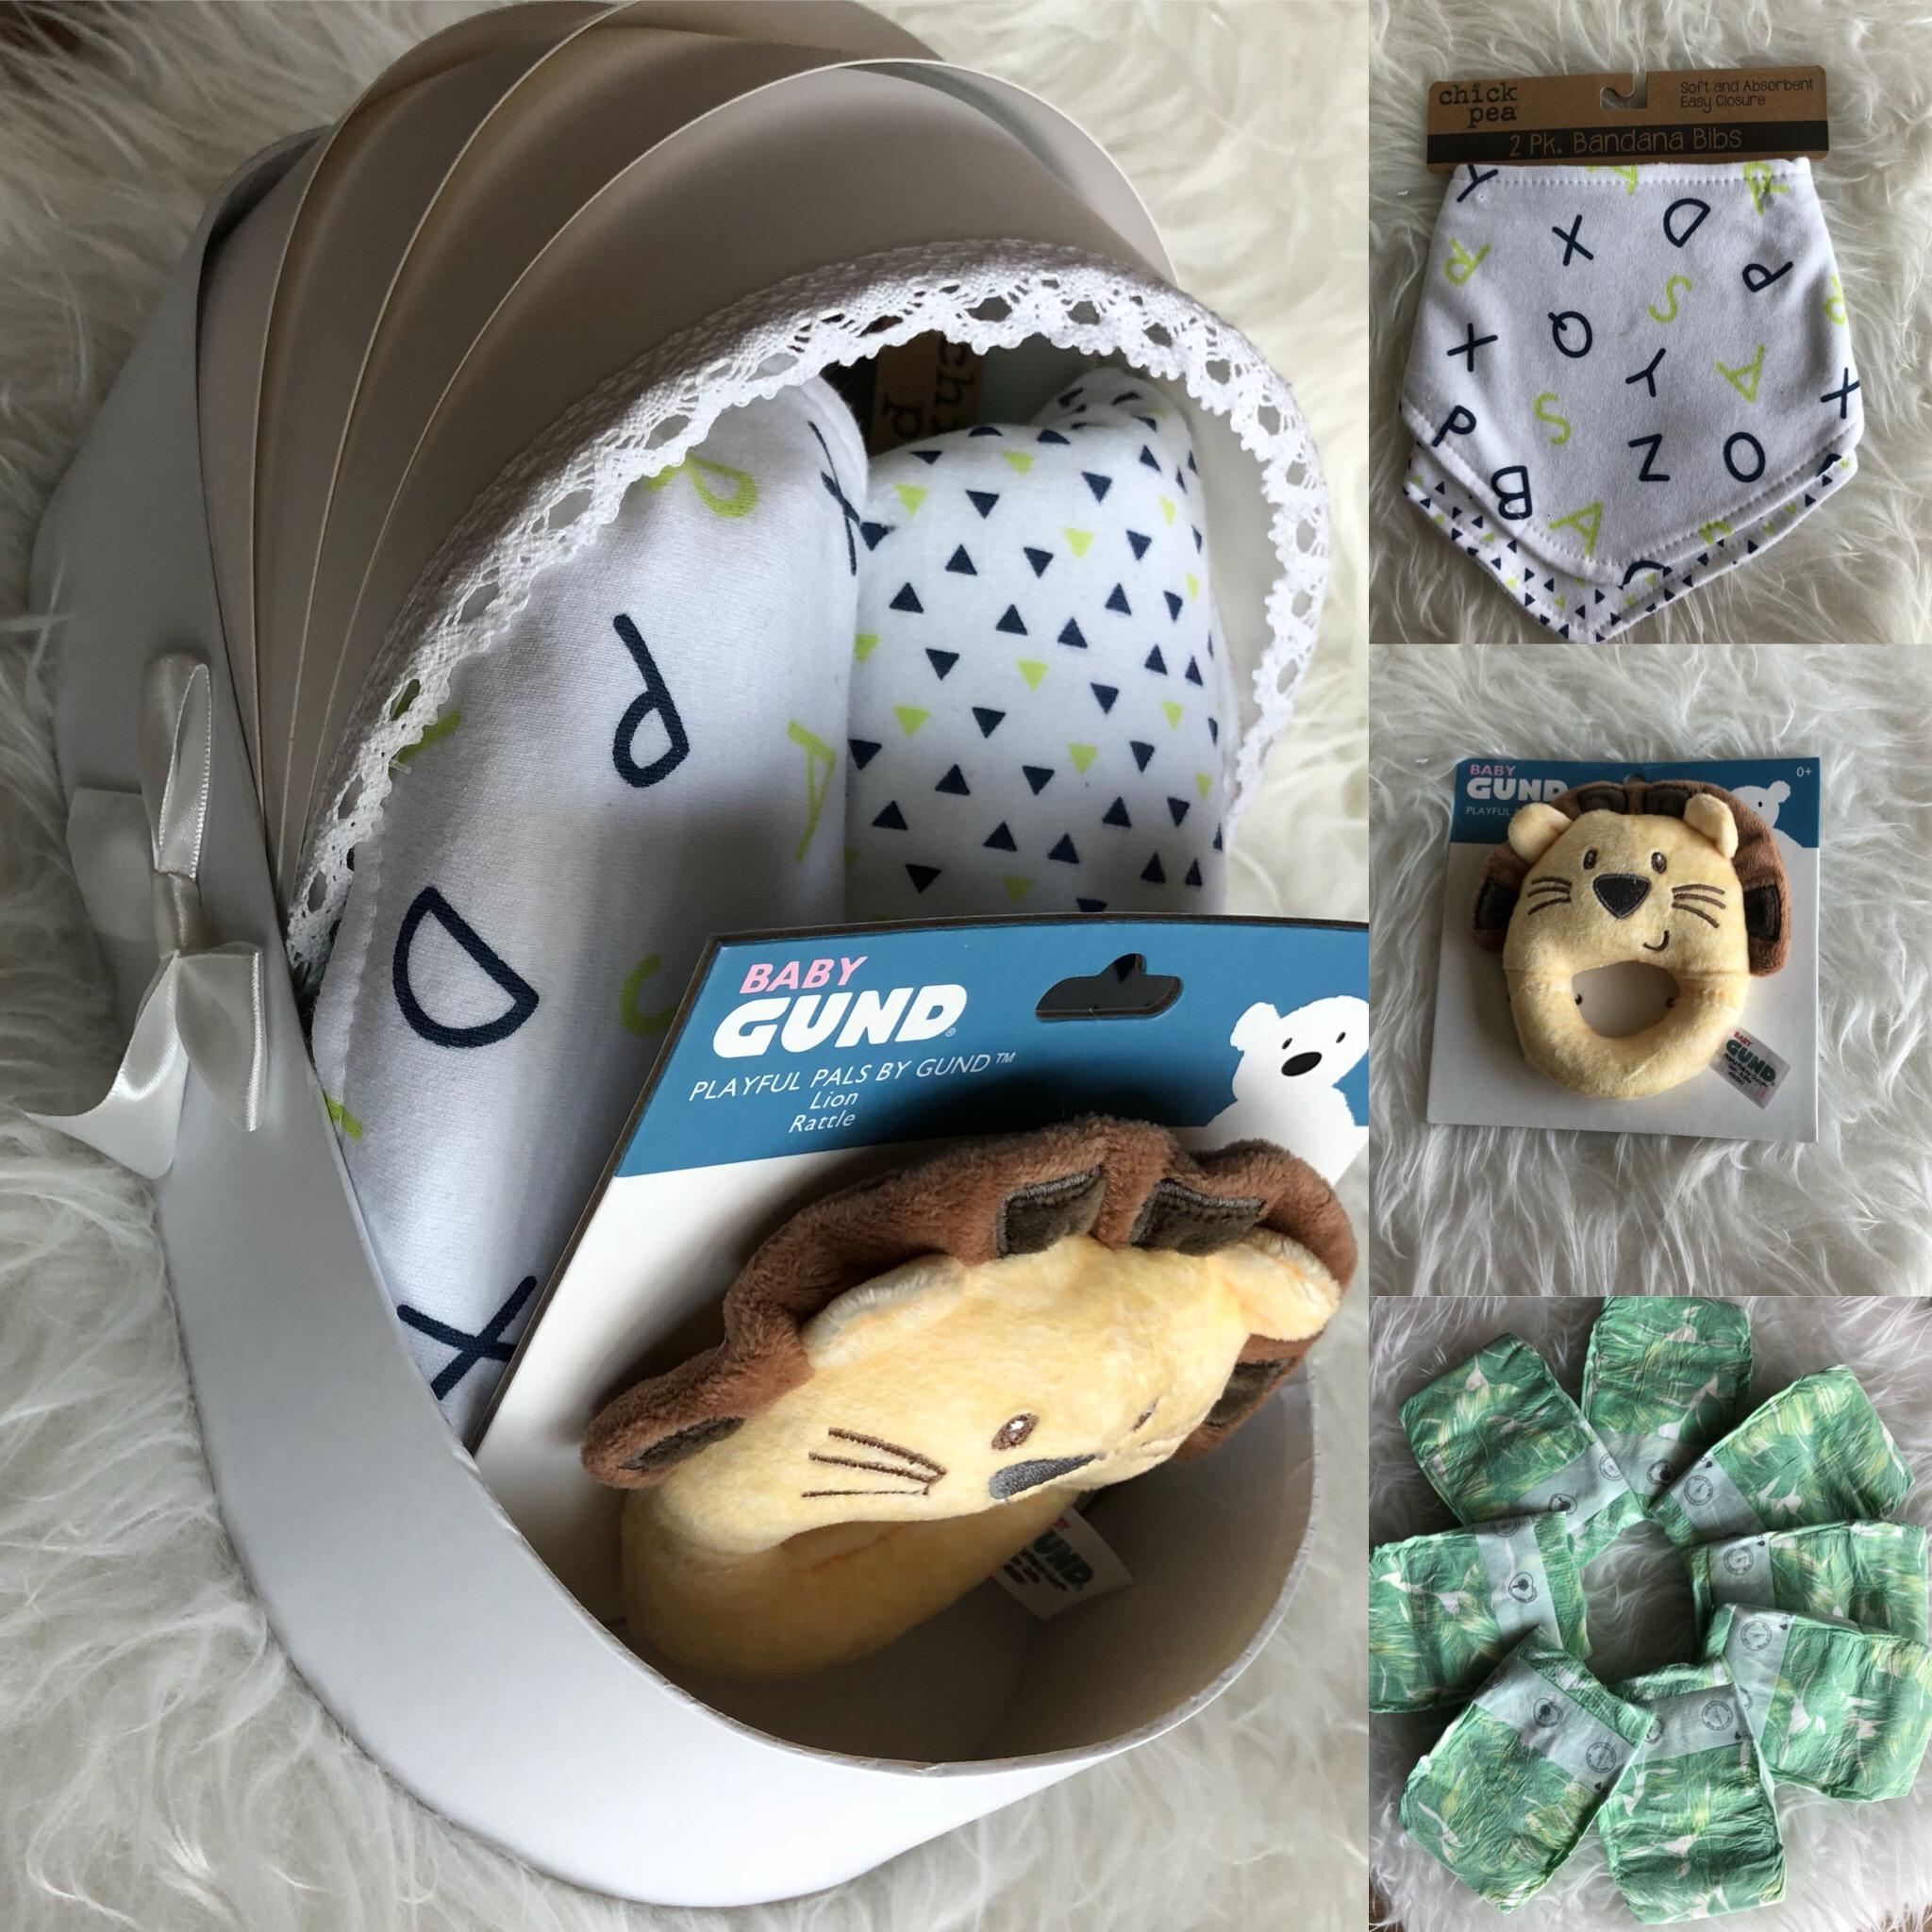 Lion Toy & bibs basket